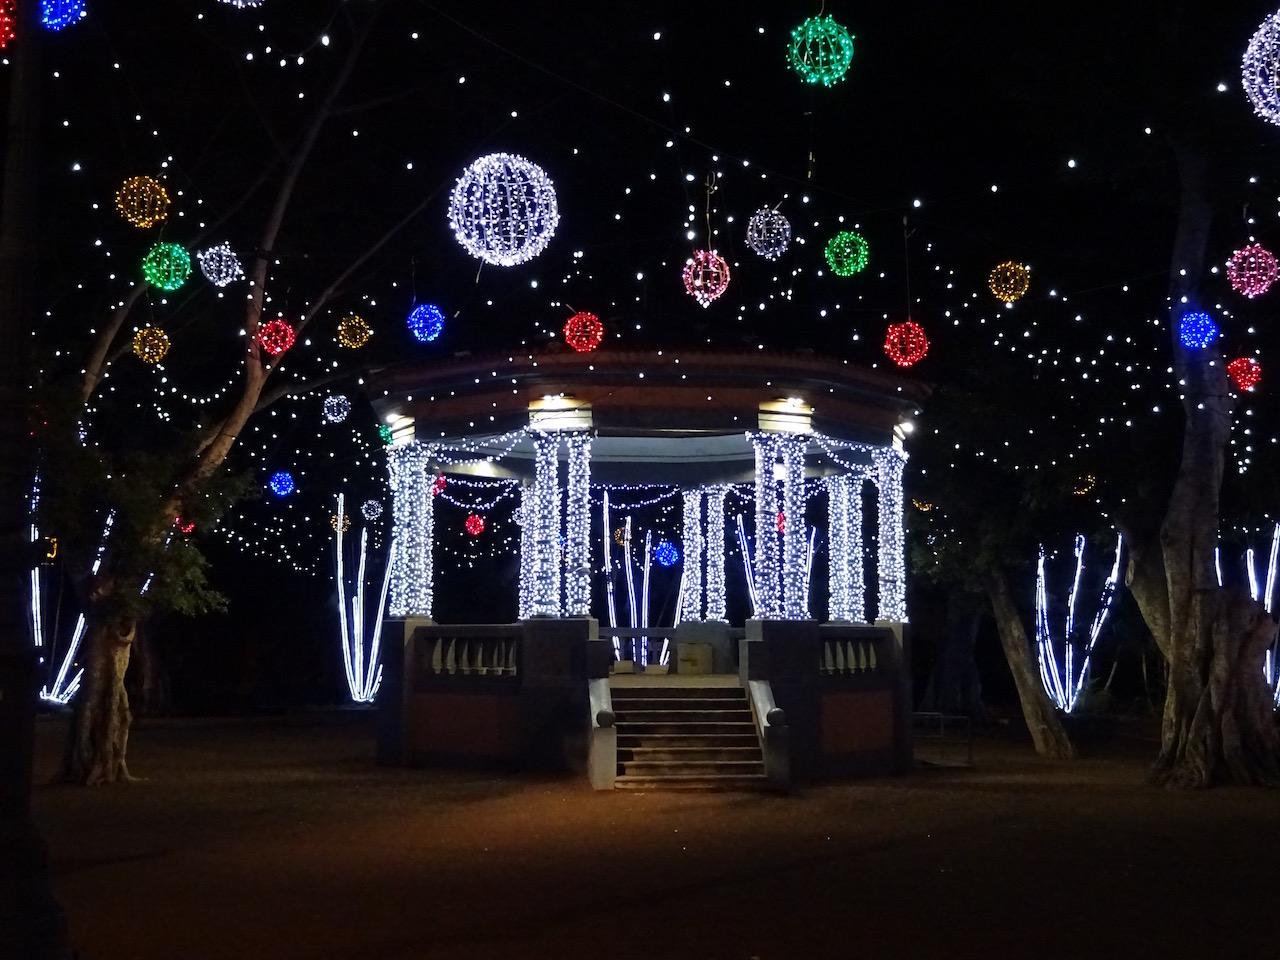 Weihnachtsbeleuchtung 8